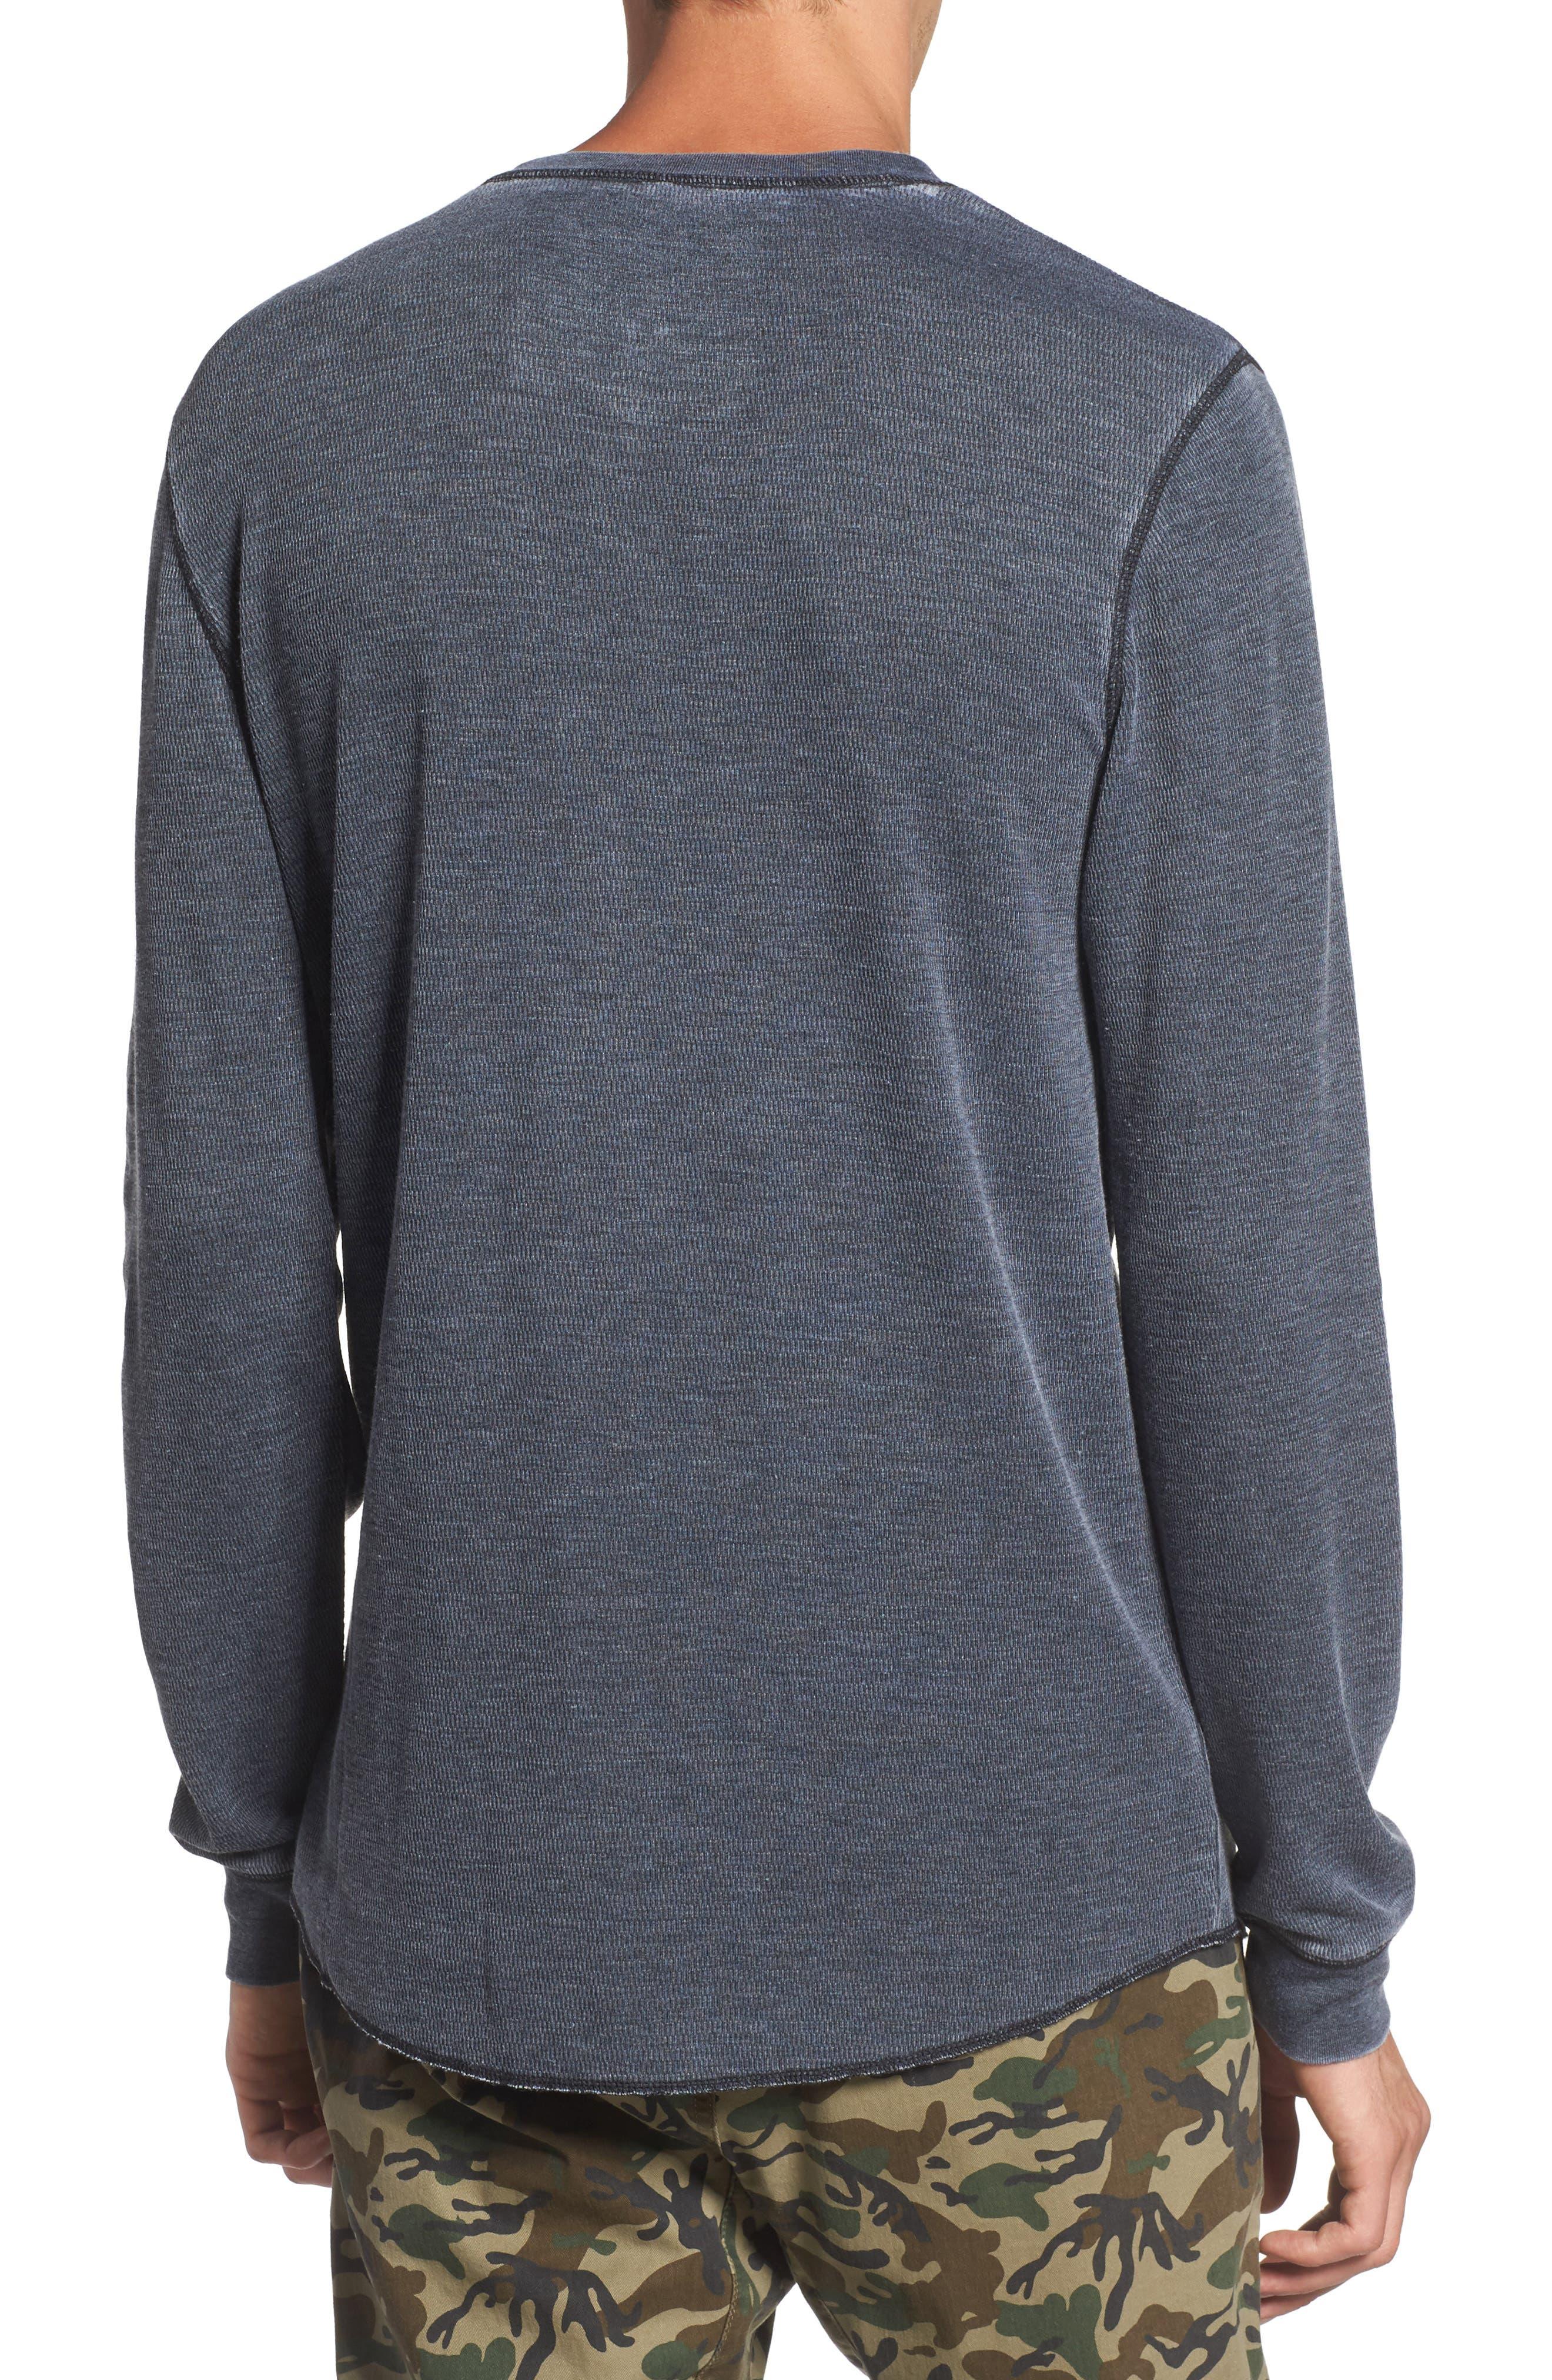 Notch Neck Thermal T-Shirt,                             Alternate thumbnail 2, color,                             Black/ White Burnout